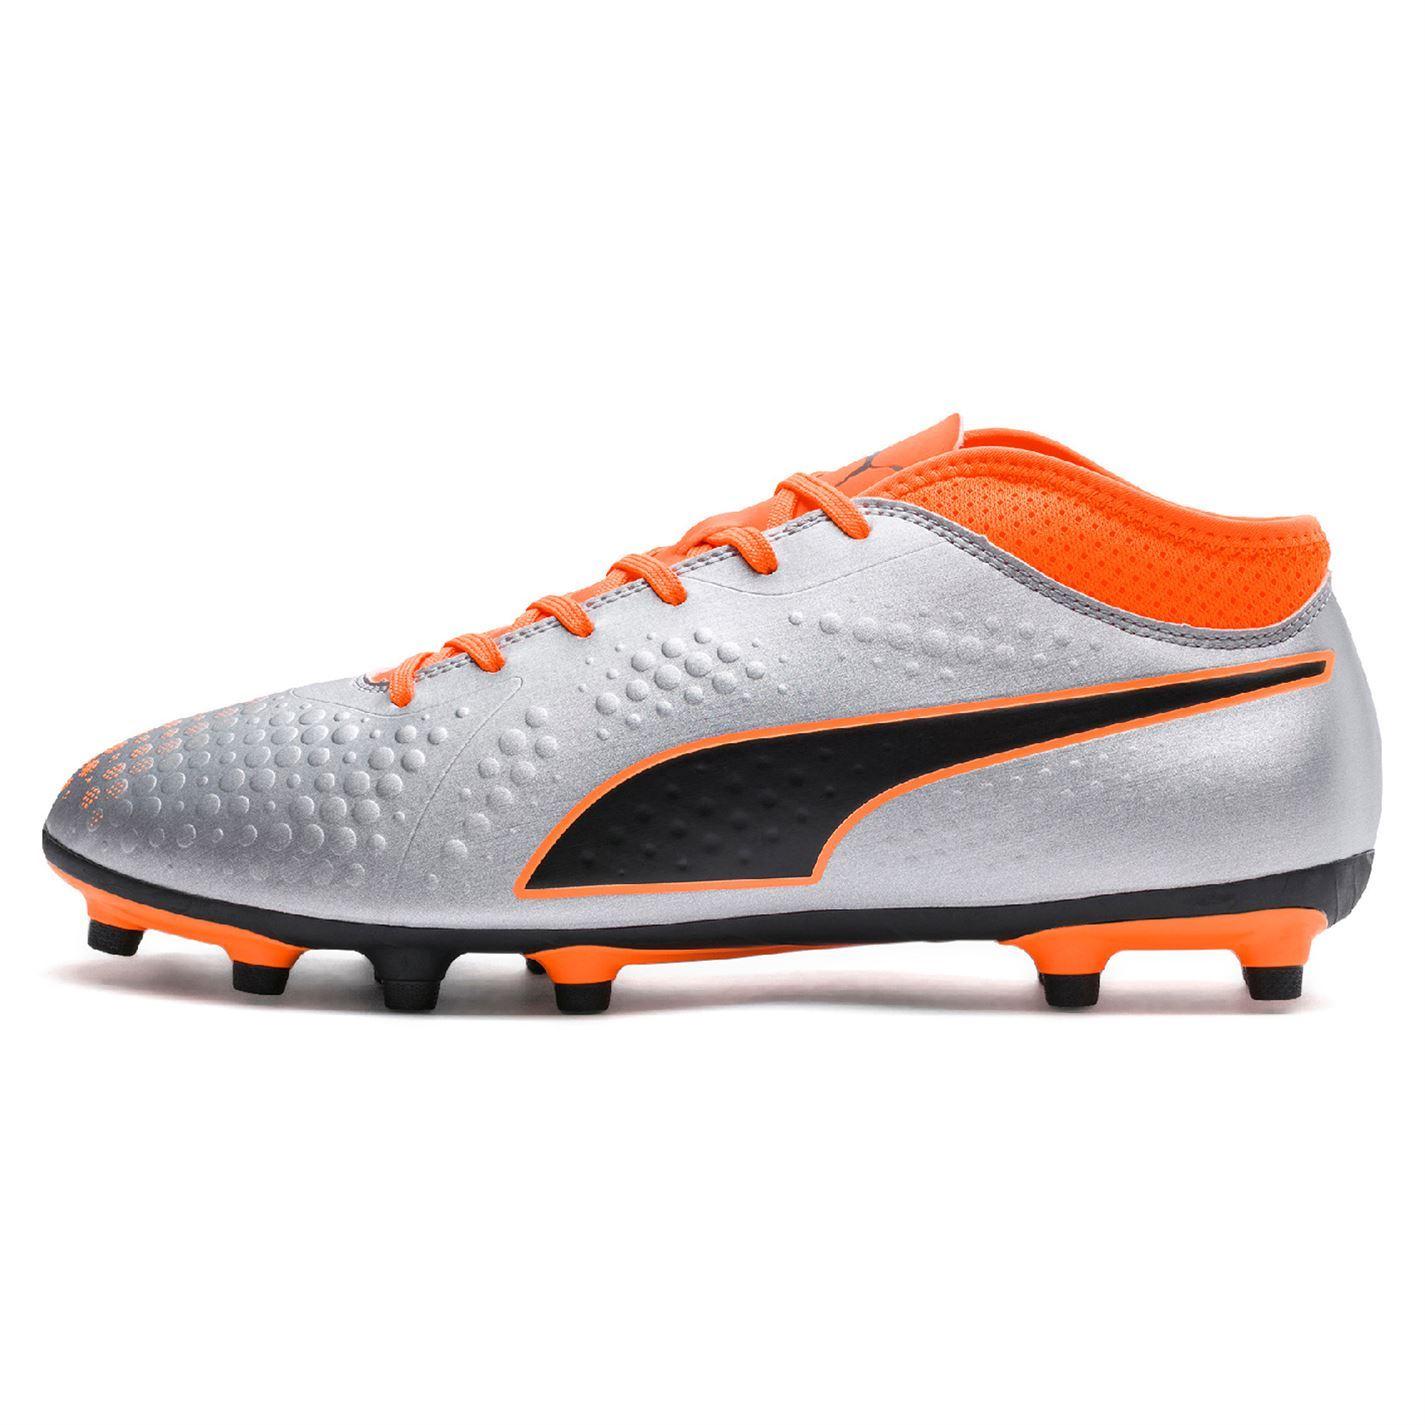 miniature 7 - Puma 4 FG Firm Ground Chaussures De Football Homme Football Chaussures Crampons